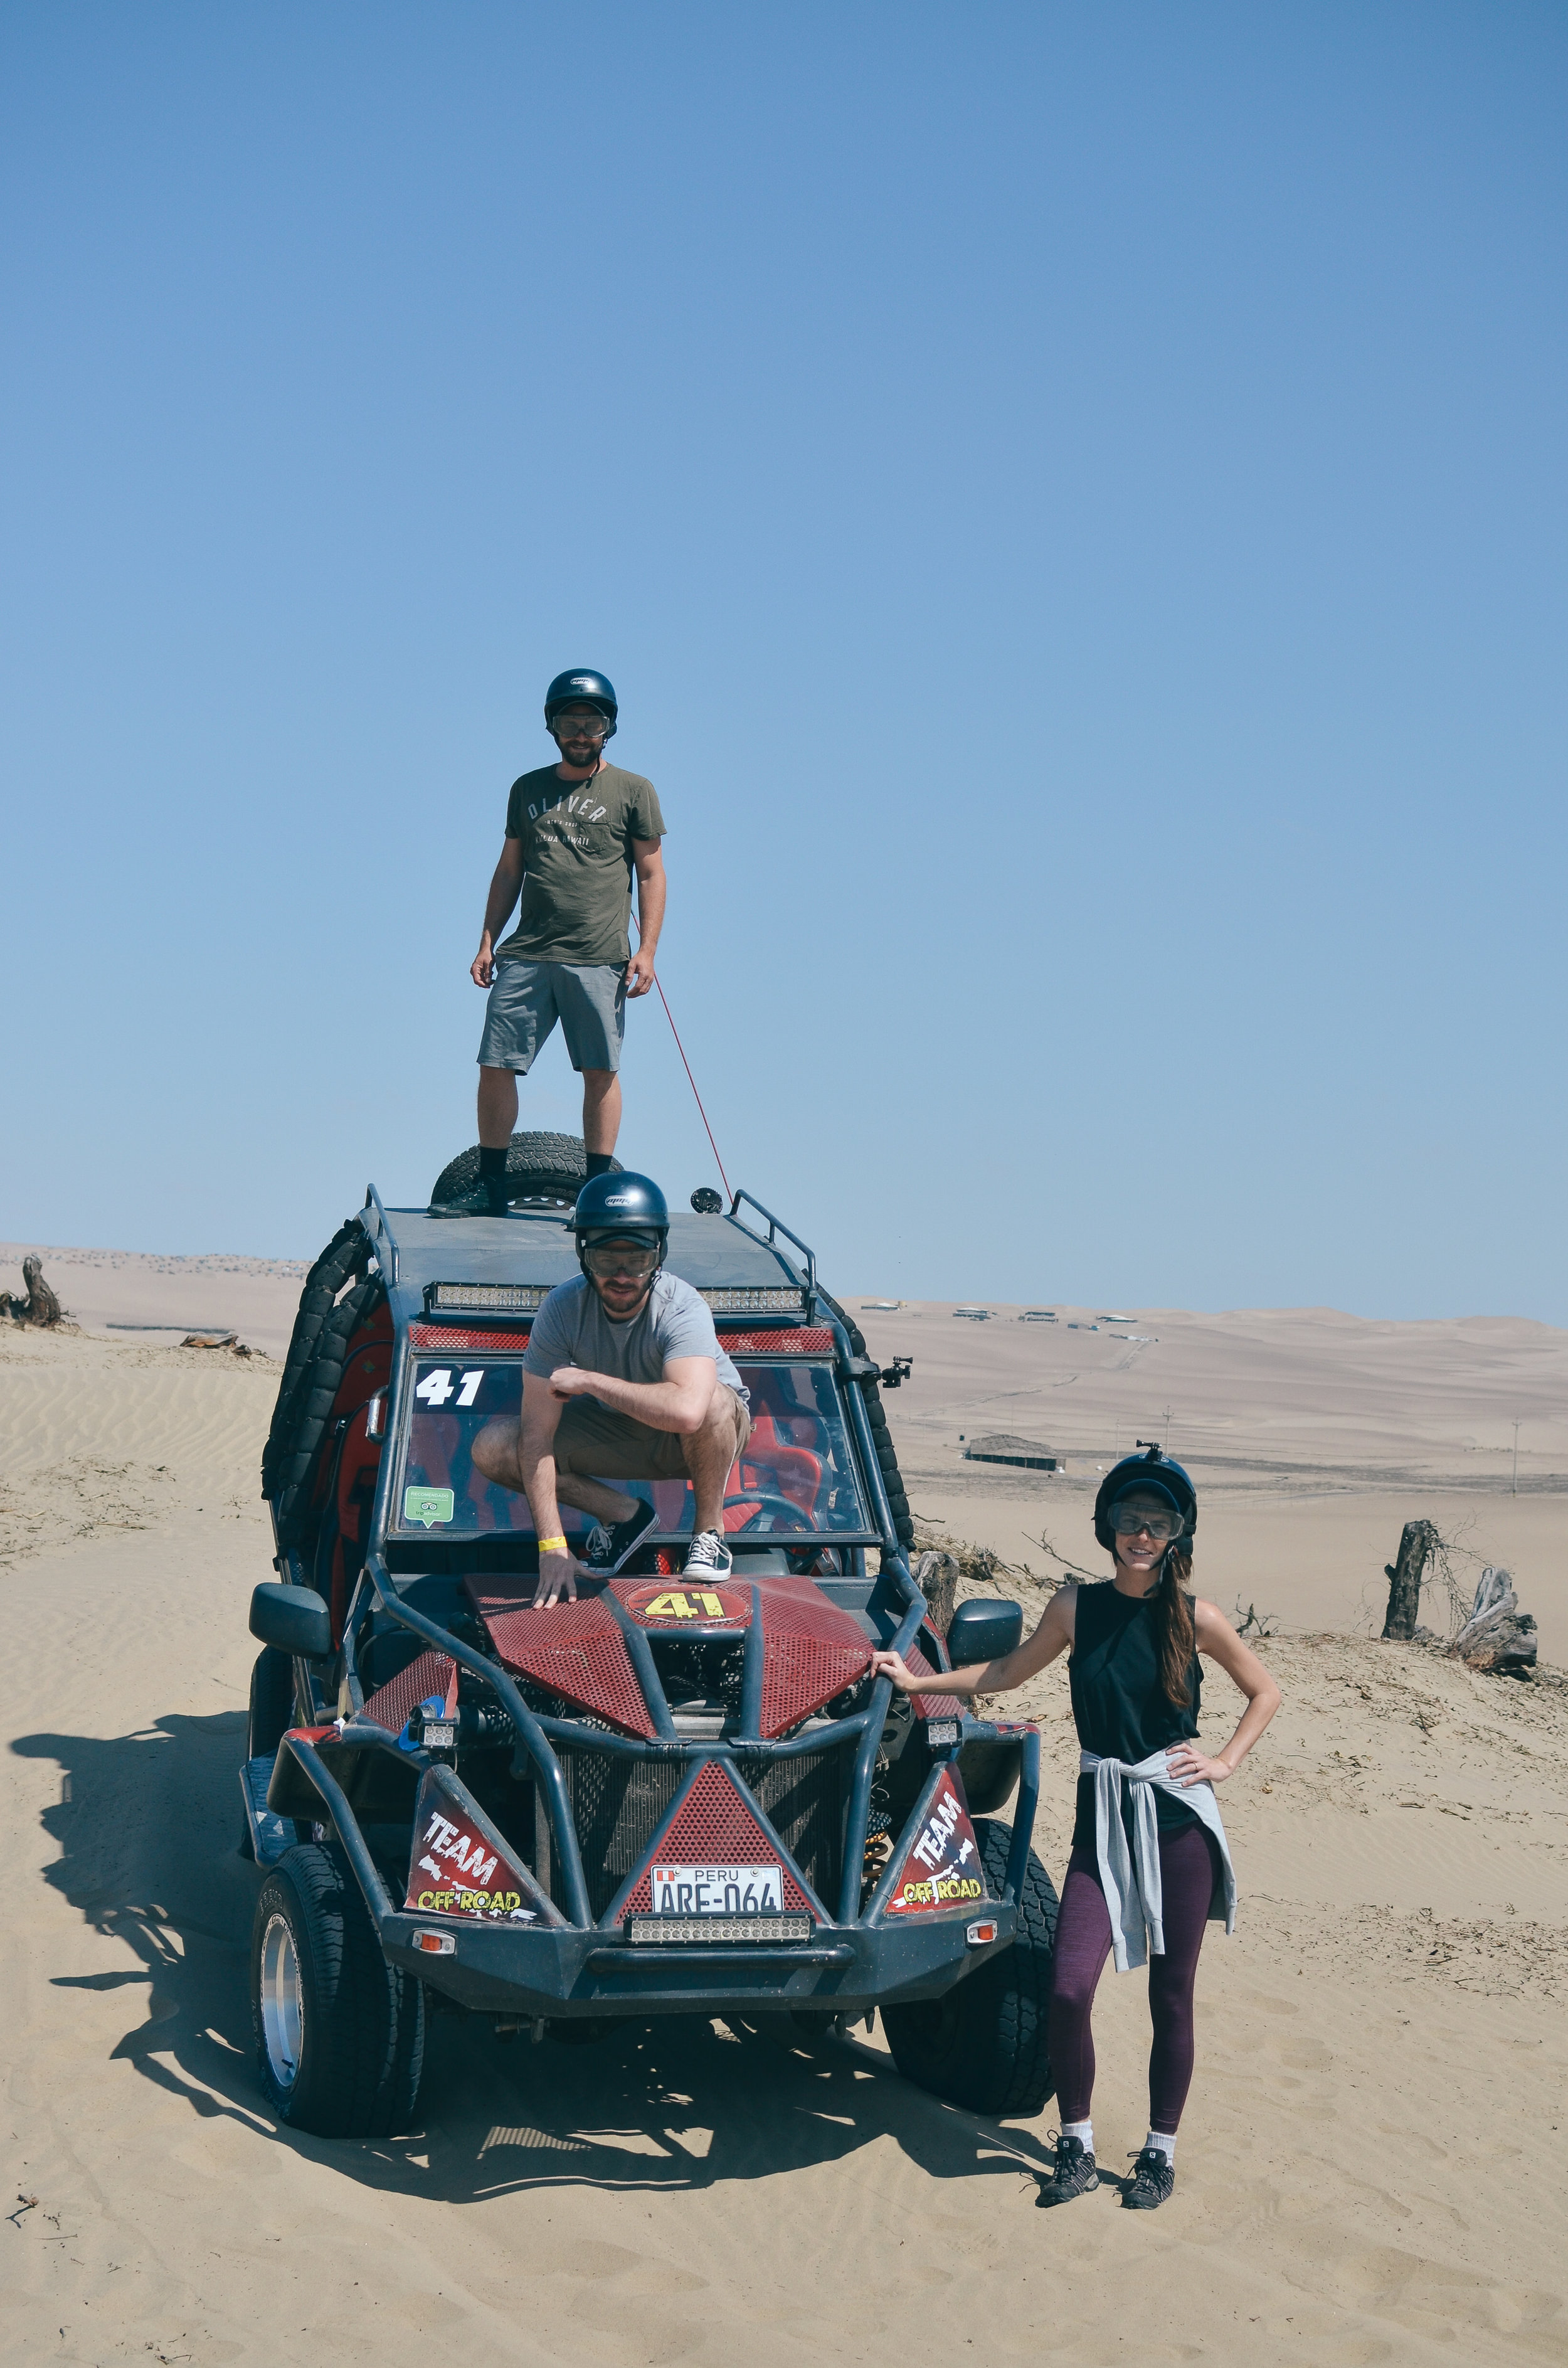 huacachina+sand+boarding+peru+travel+guide+life+on+pine+blog +exchange_DSC_1754.jpg